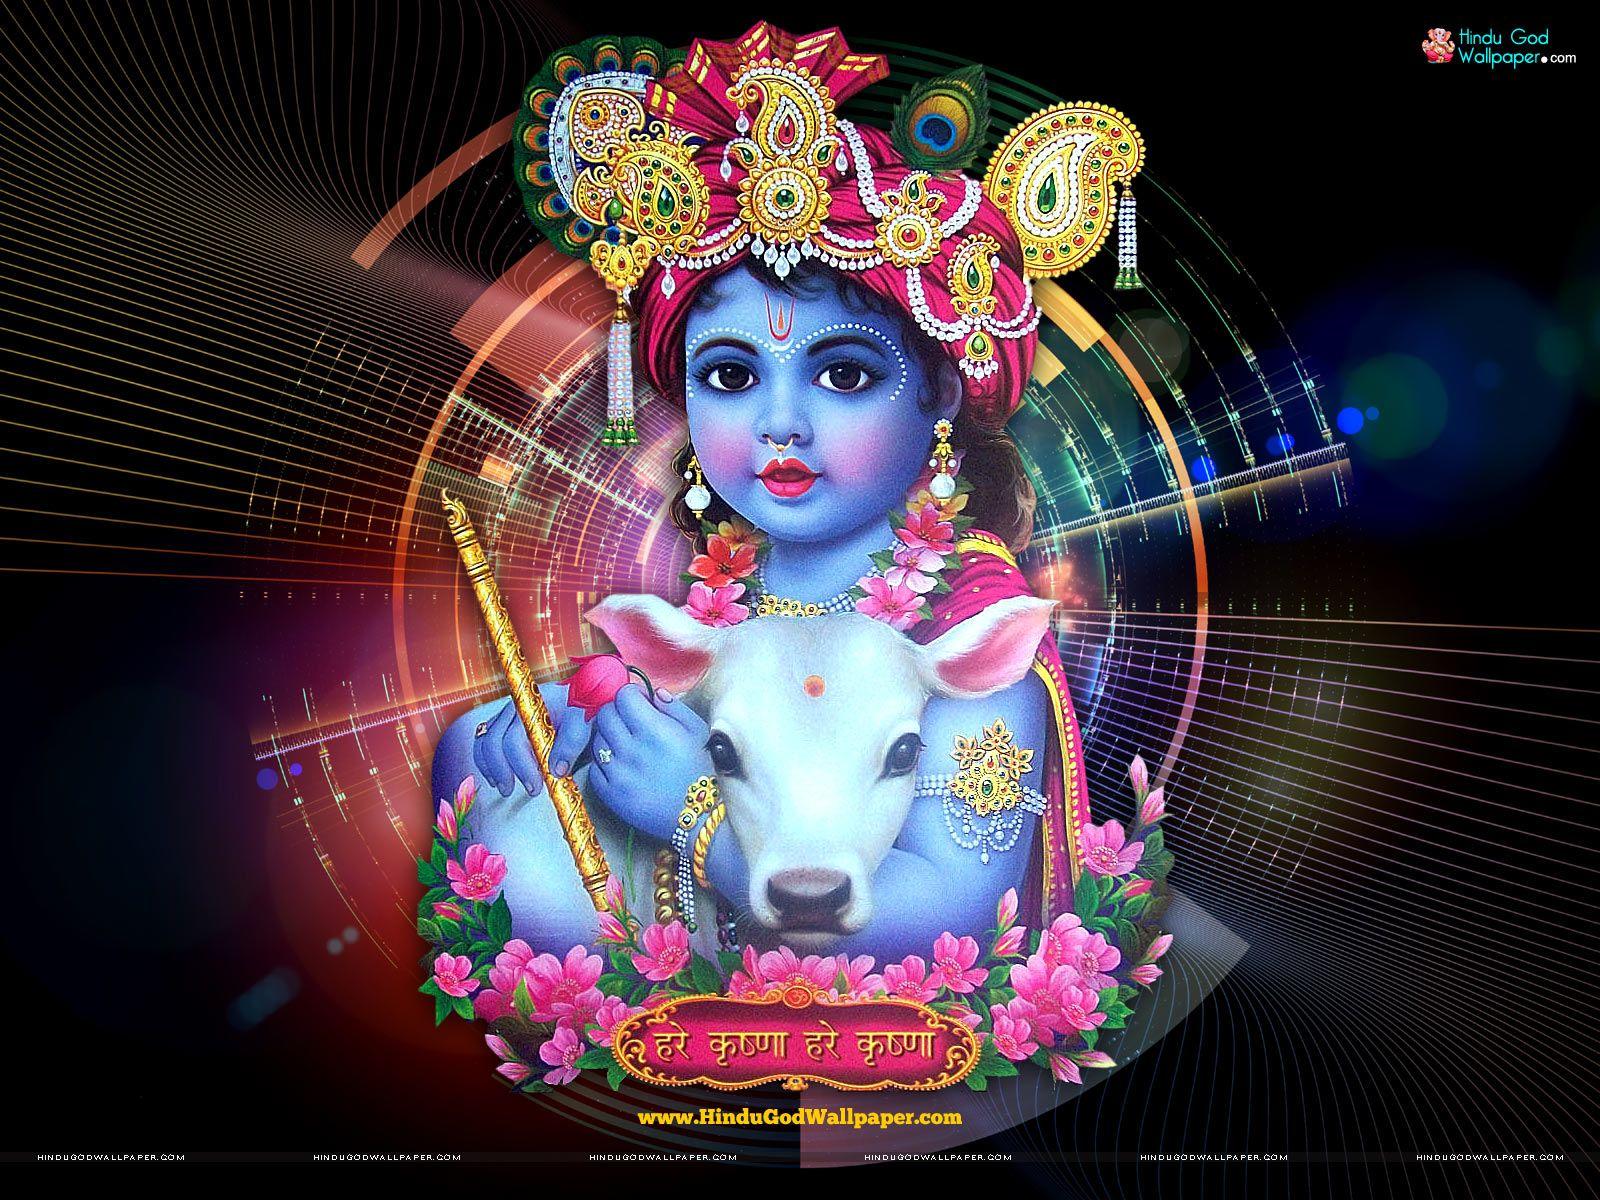 Lord Krishna Childhood Hd Wallpapers Free Download Lord Krishna Hd Wallpaper Android Wallpaper Lord Krishna Wallpapers